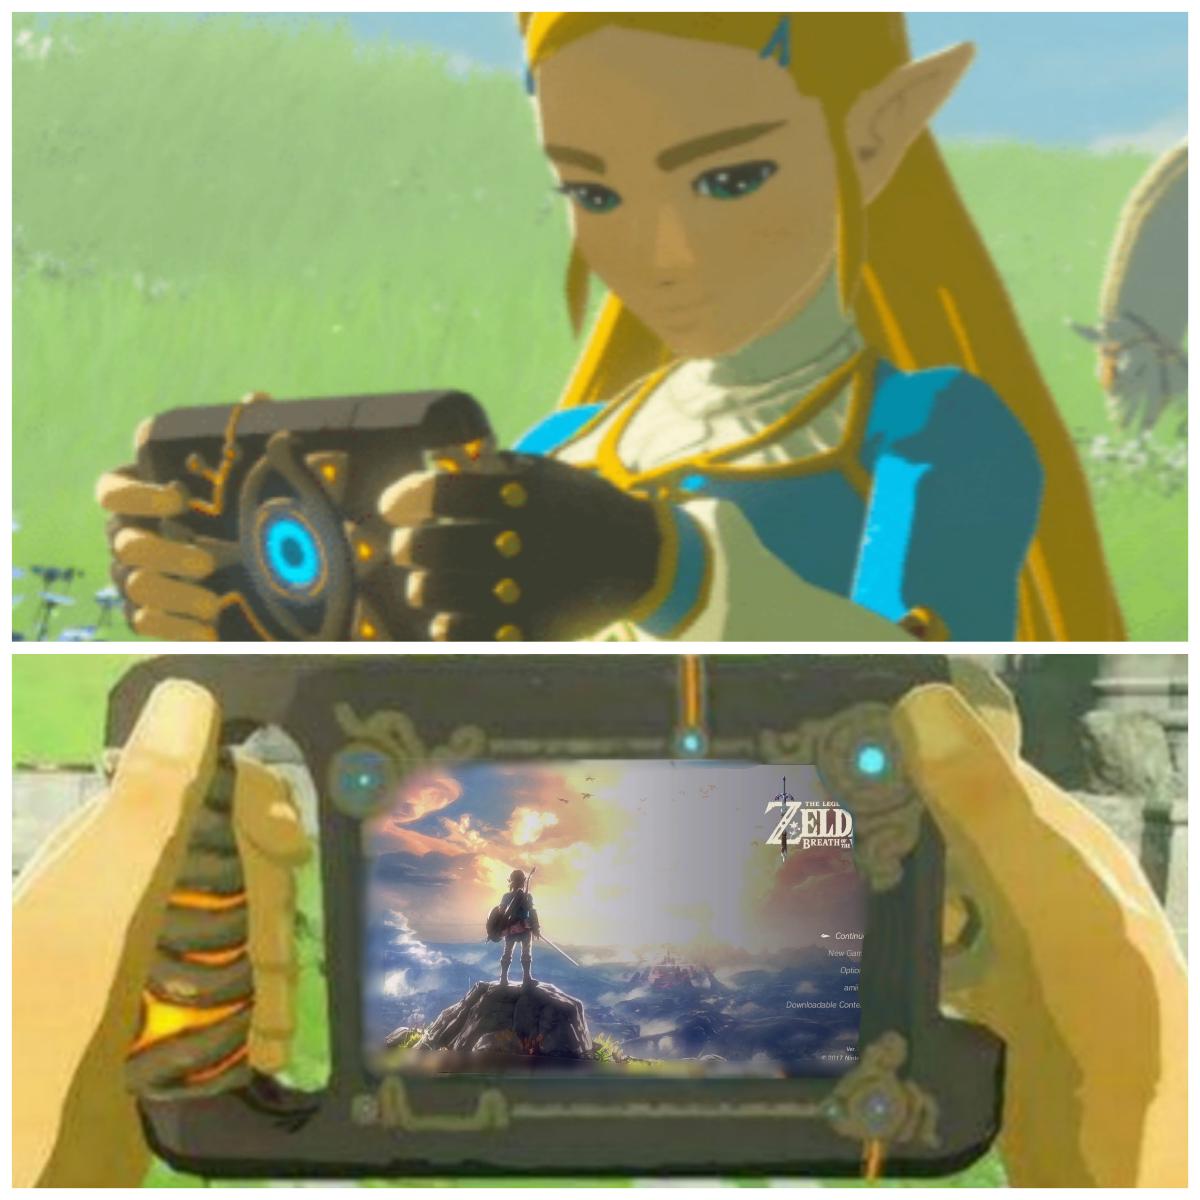 Zelda Is A Boy And You Play As Him Visit Blazezelda Tumblr Com Game Pictures Zelda Art Legend Of Zelda Breath